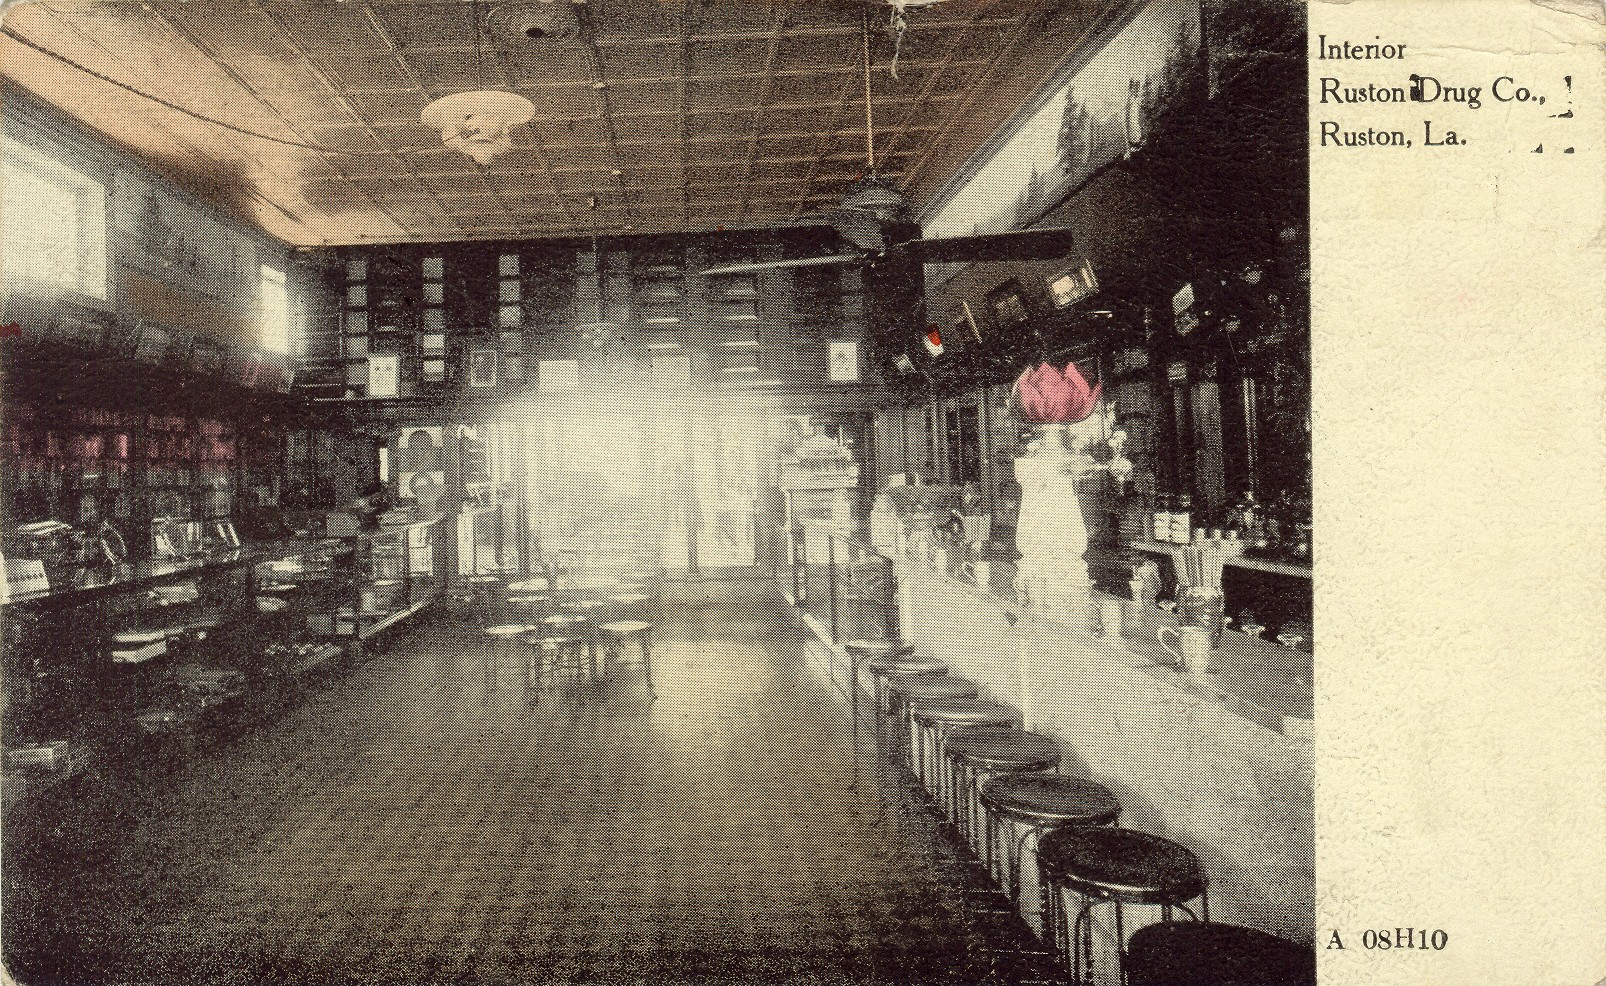 Ruston Drug Company. The original floor remains.